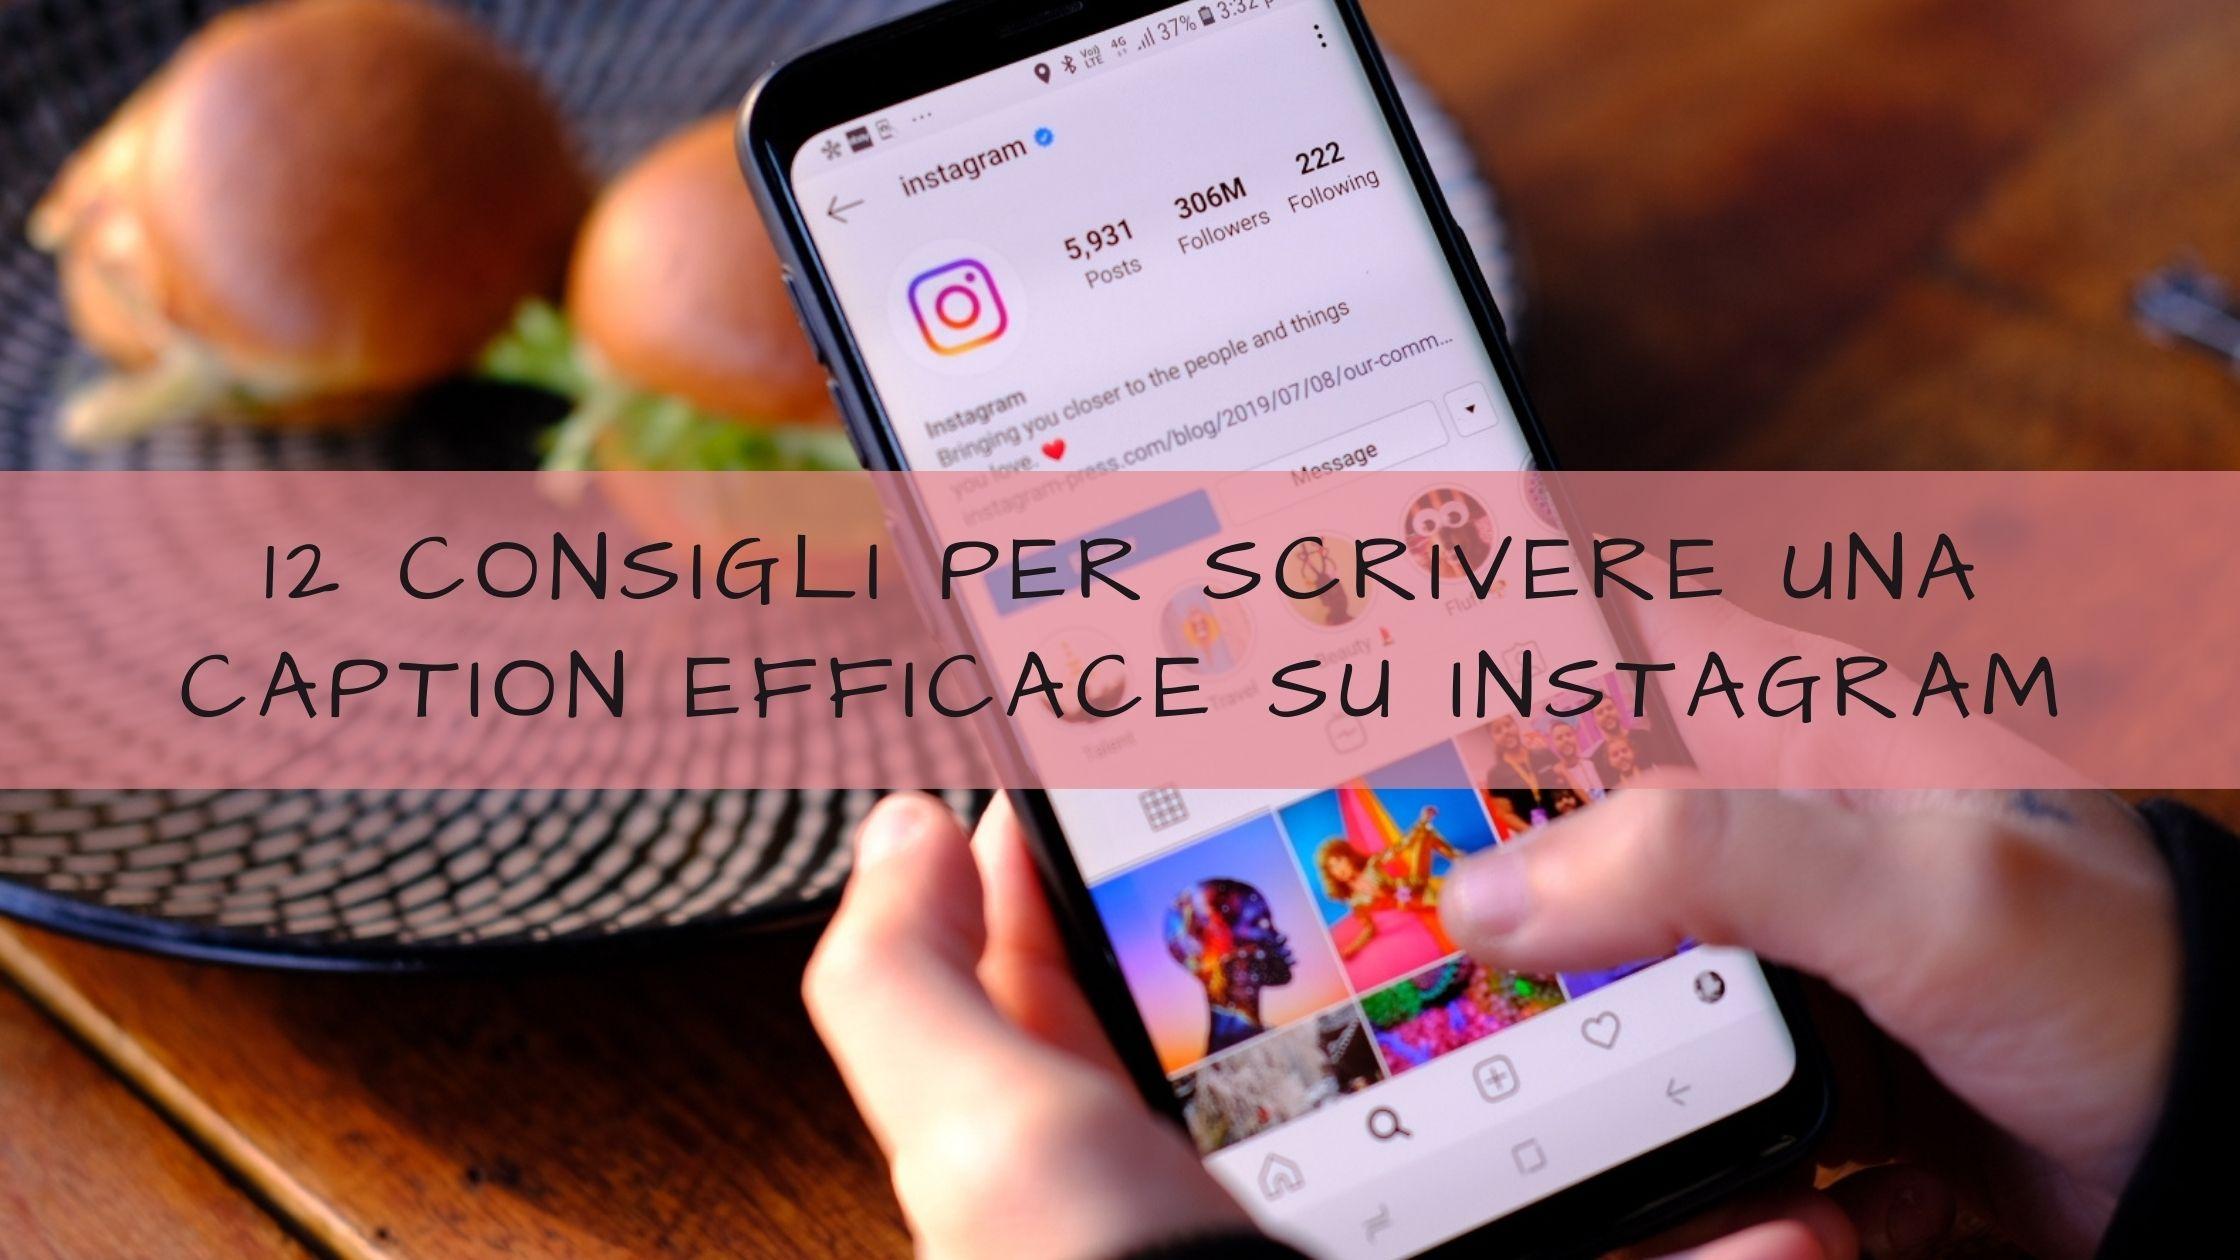 didascalie su instagram